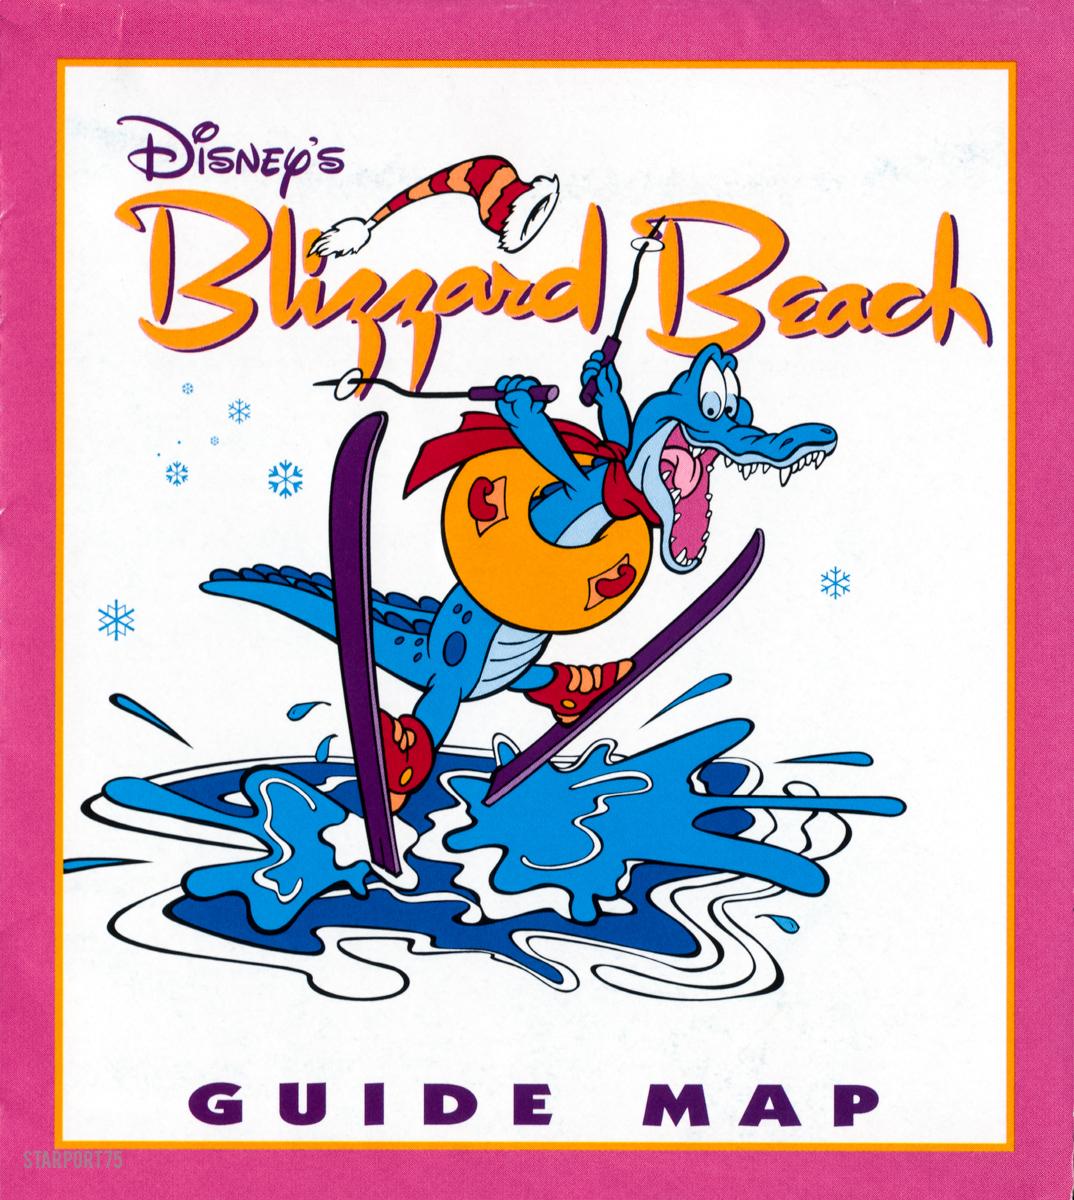 Disney S Blizzard Beach Guide Map 1995 Starport75